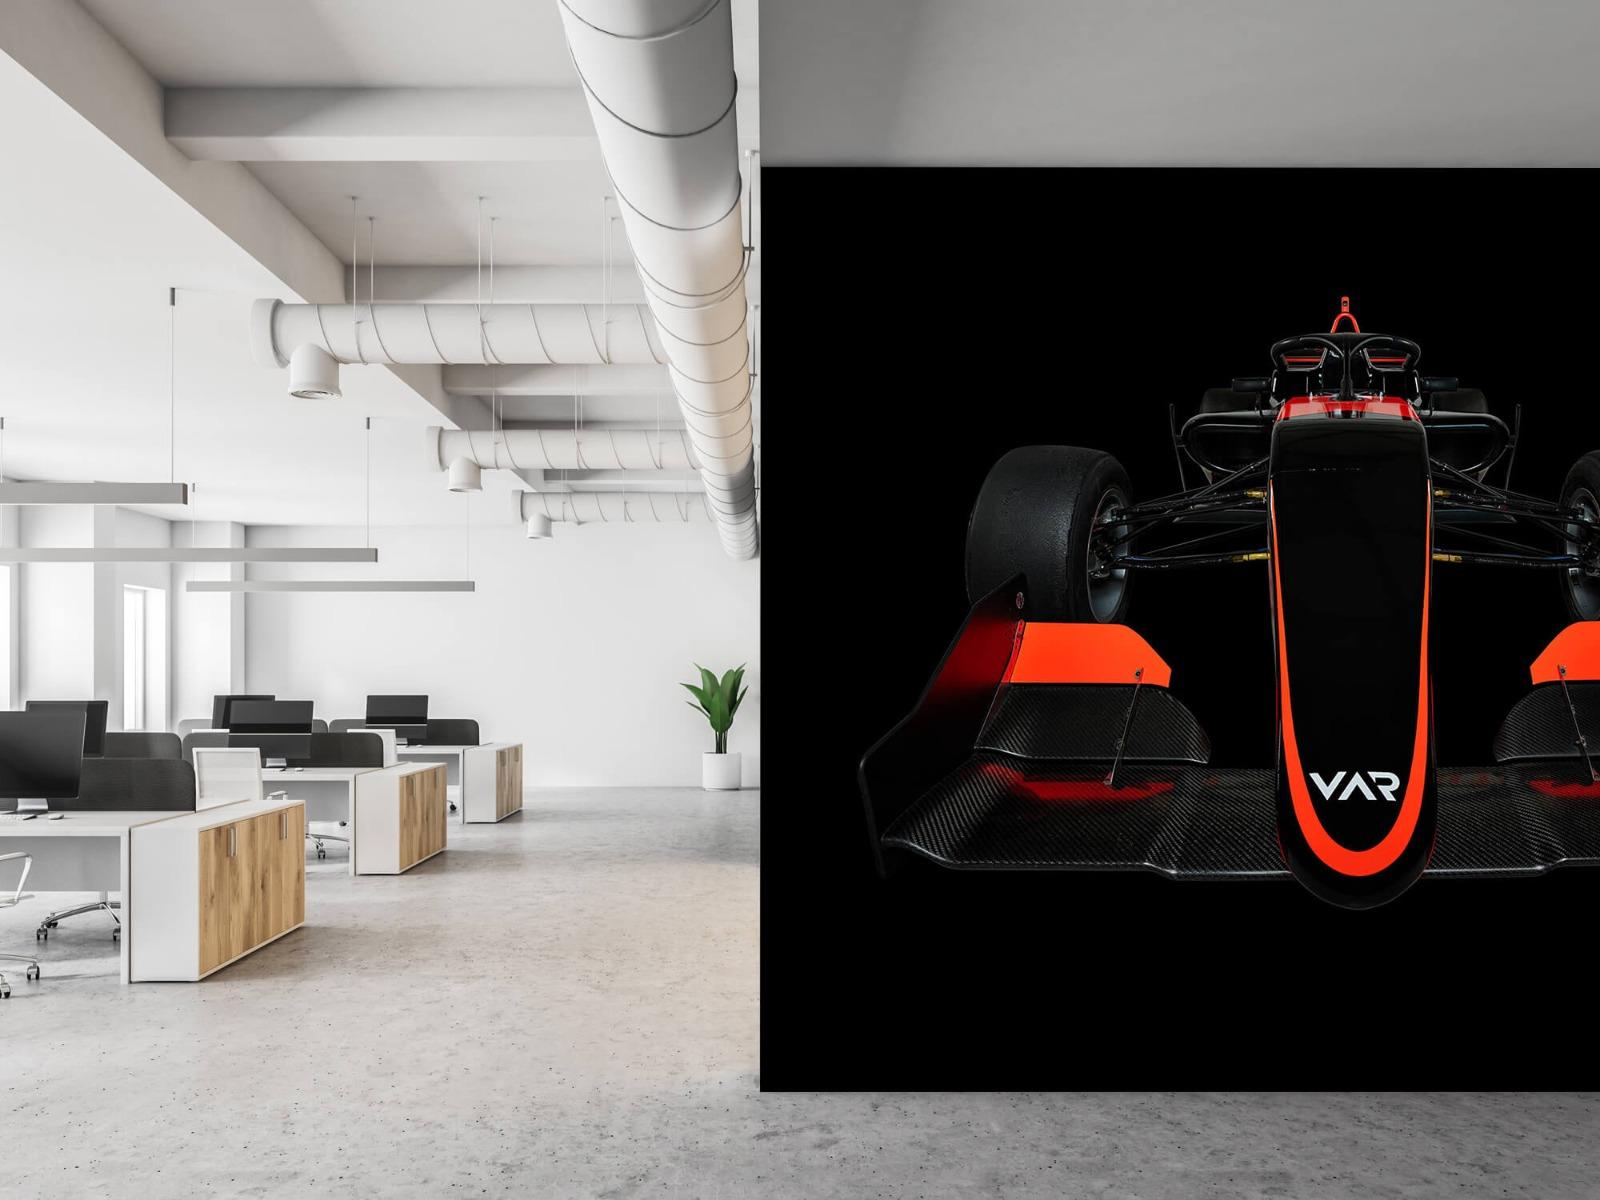 Sportauto's - Formule 3 - Lower front view - dark - Slaapkamer 21